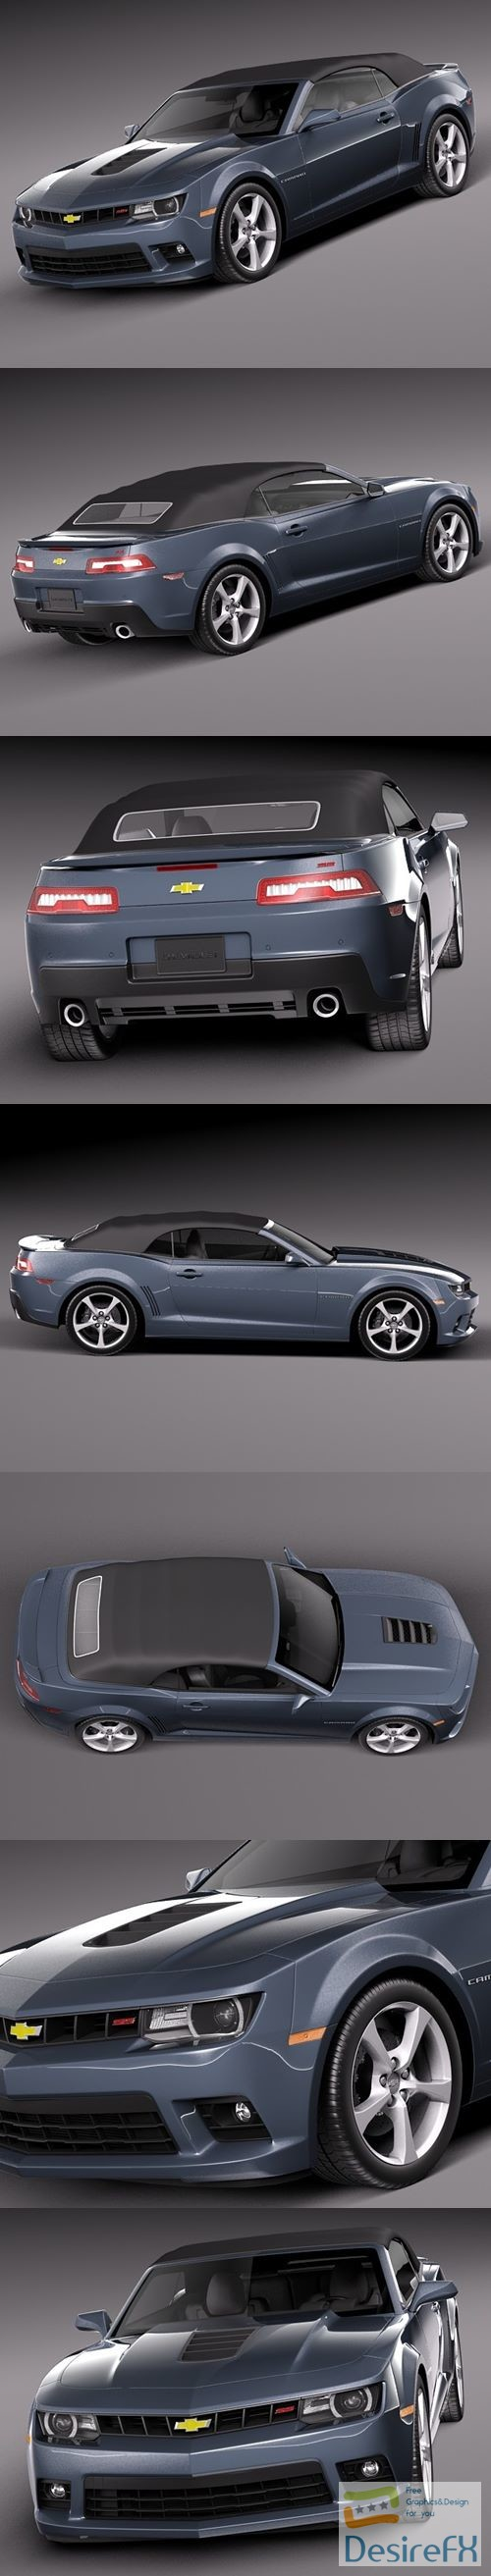 Chevrolet Camaro SS Convertible 2014 3D Model